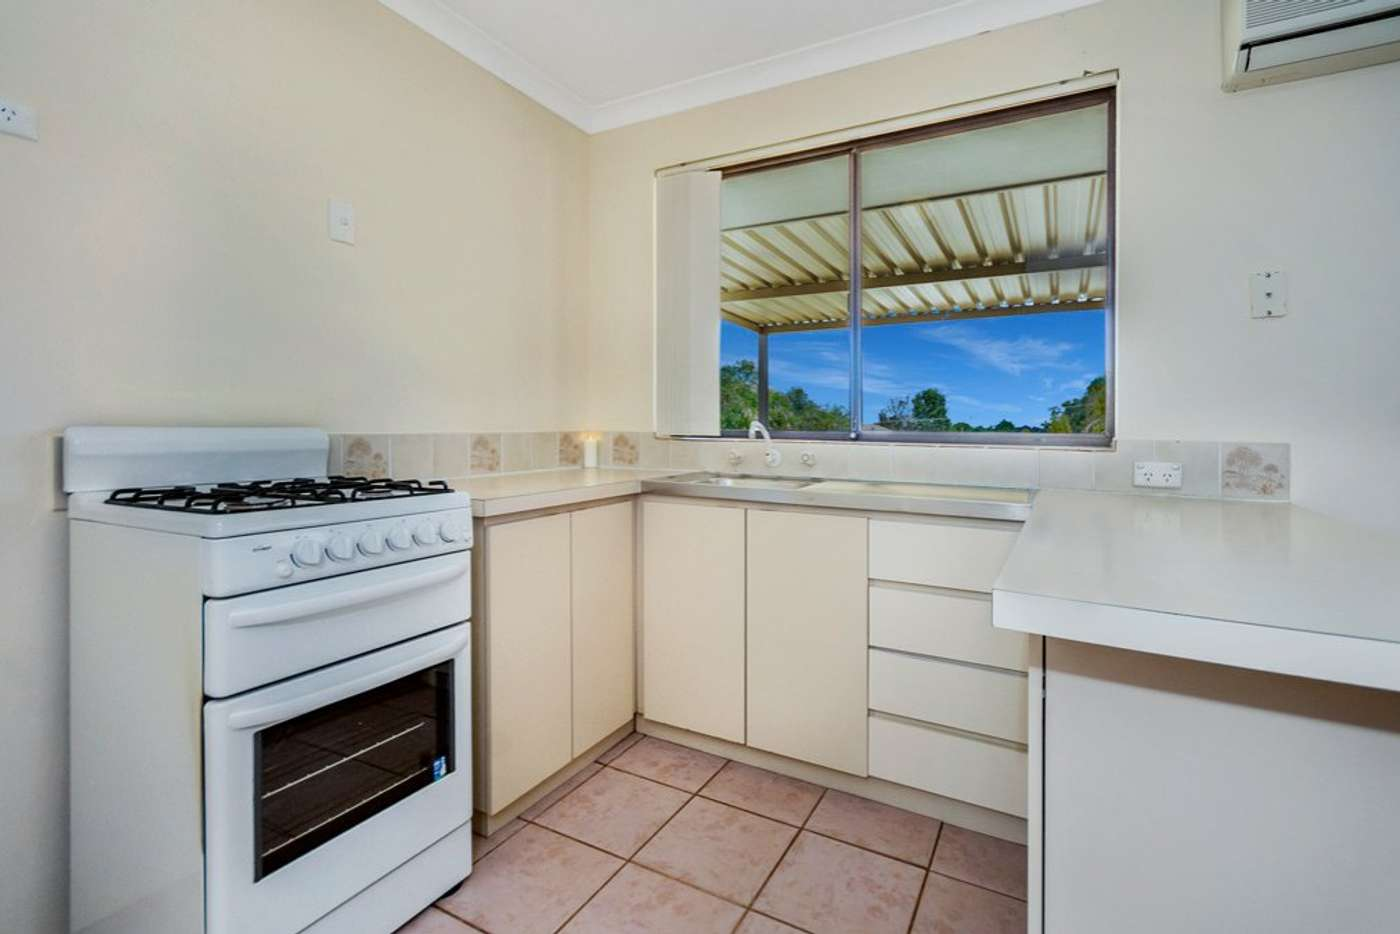 Sixth view of Homely house listing, 129 Parmelia Avenue, Parmelia WA 6167